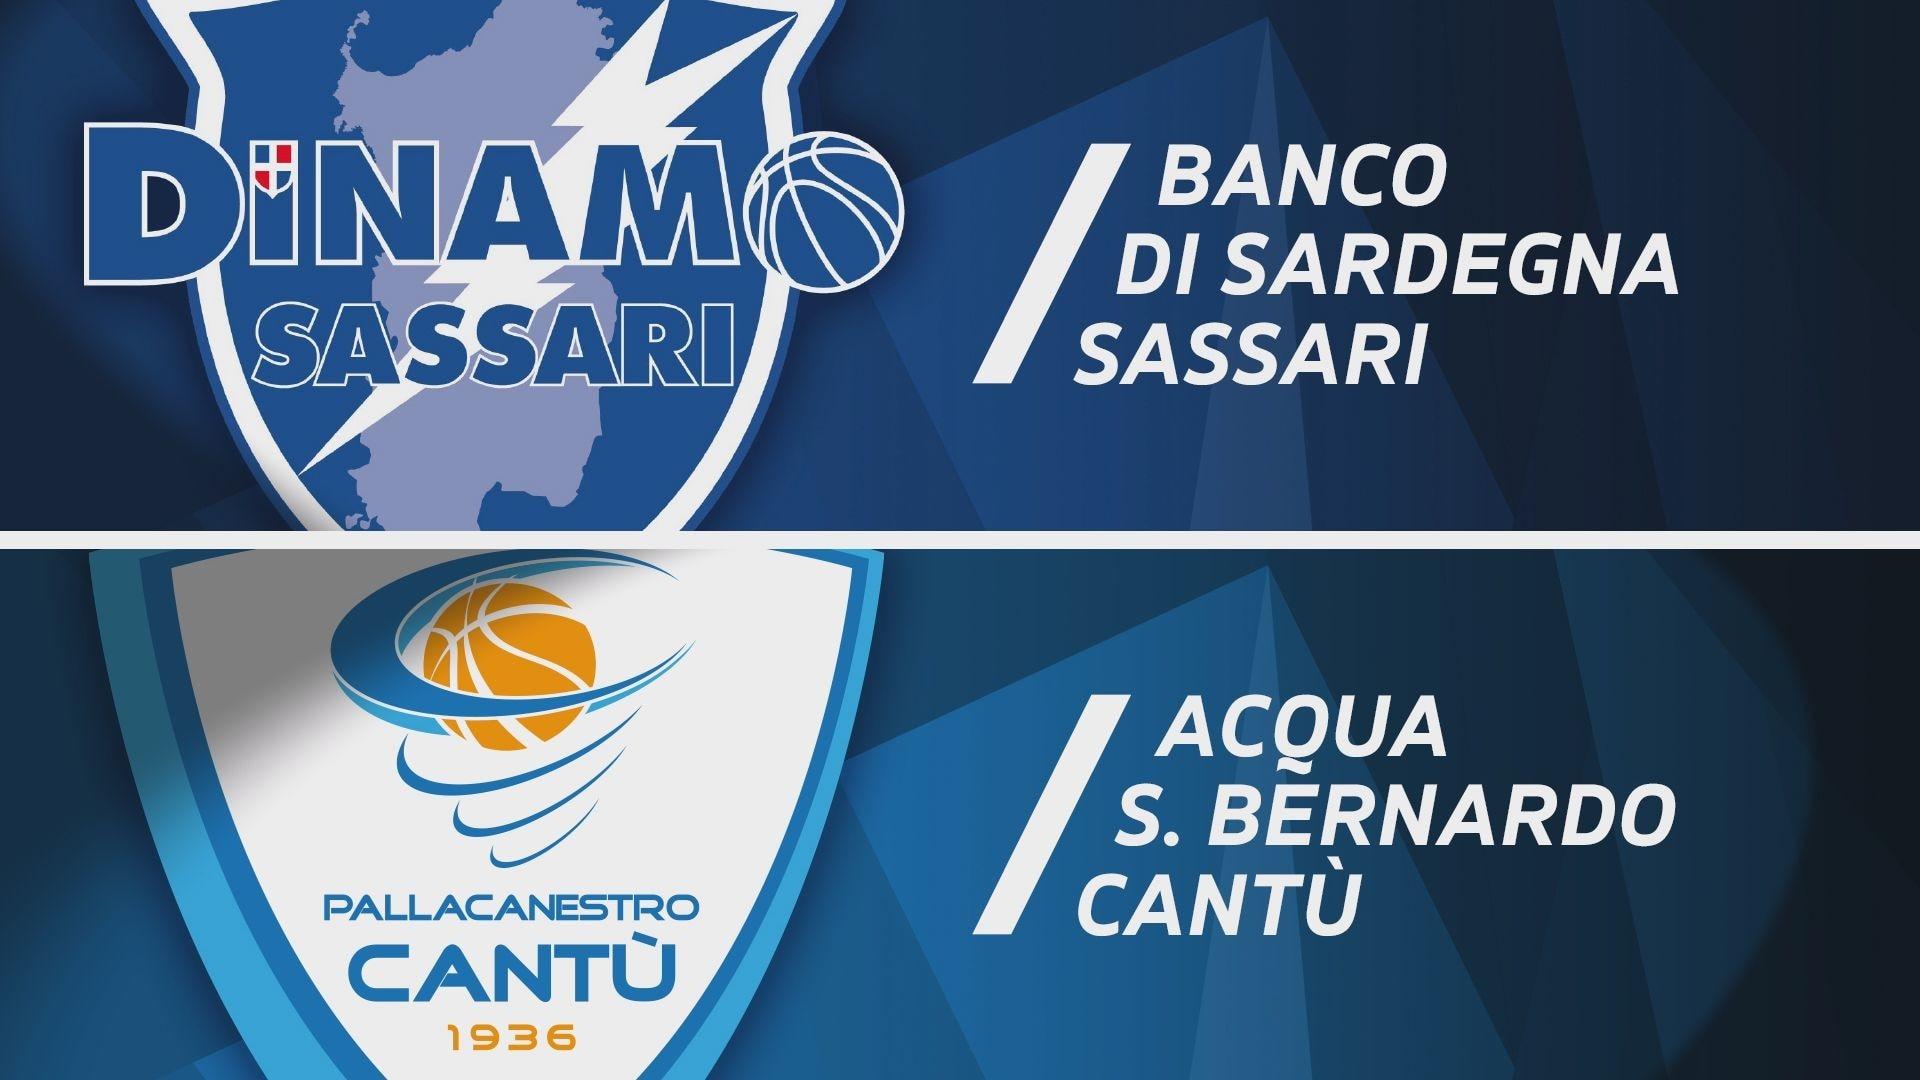 Banco di Sardegna Sassari - Acqua S.Bernardo Cantù 98-92